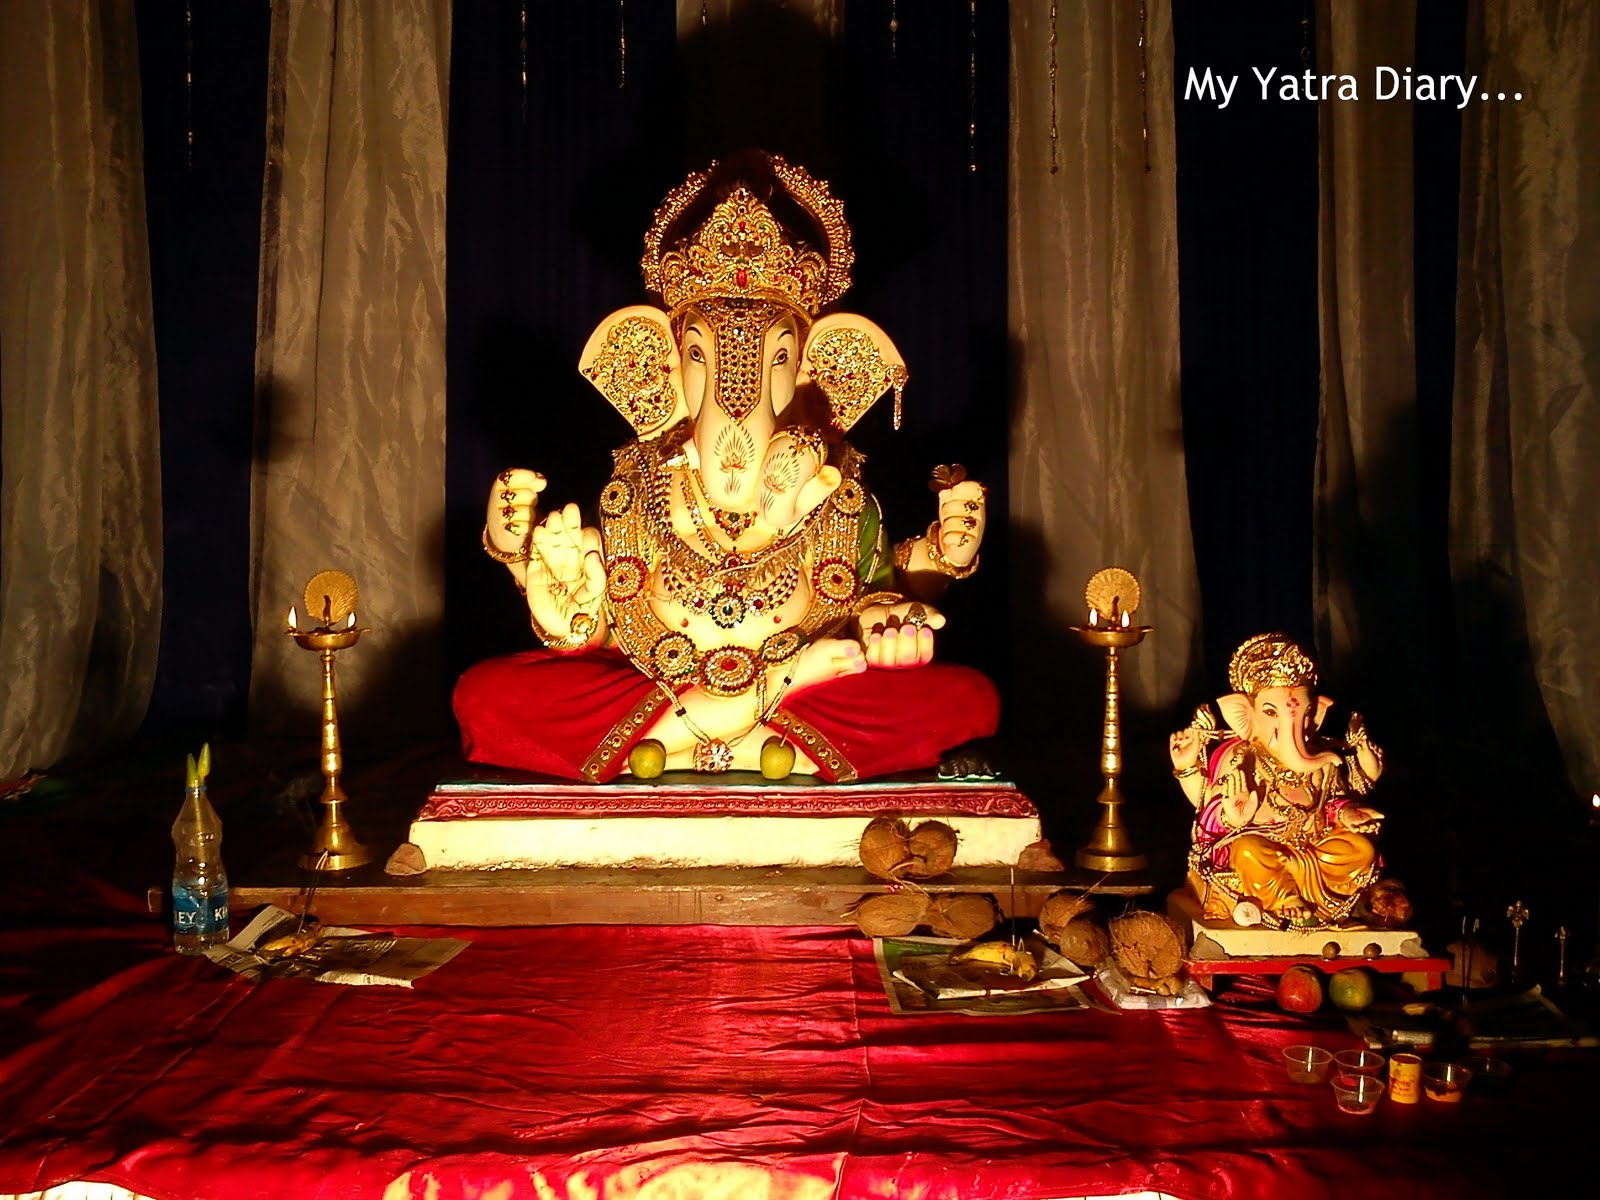 Ganesh chaturthi flowers may flower blog - Ganpati Pandal Decorated During The Ganesh Chaturthi Festival